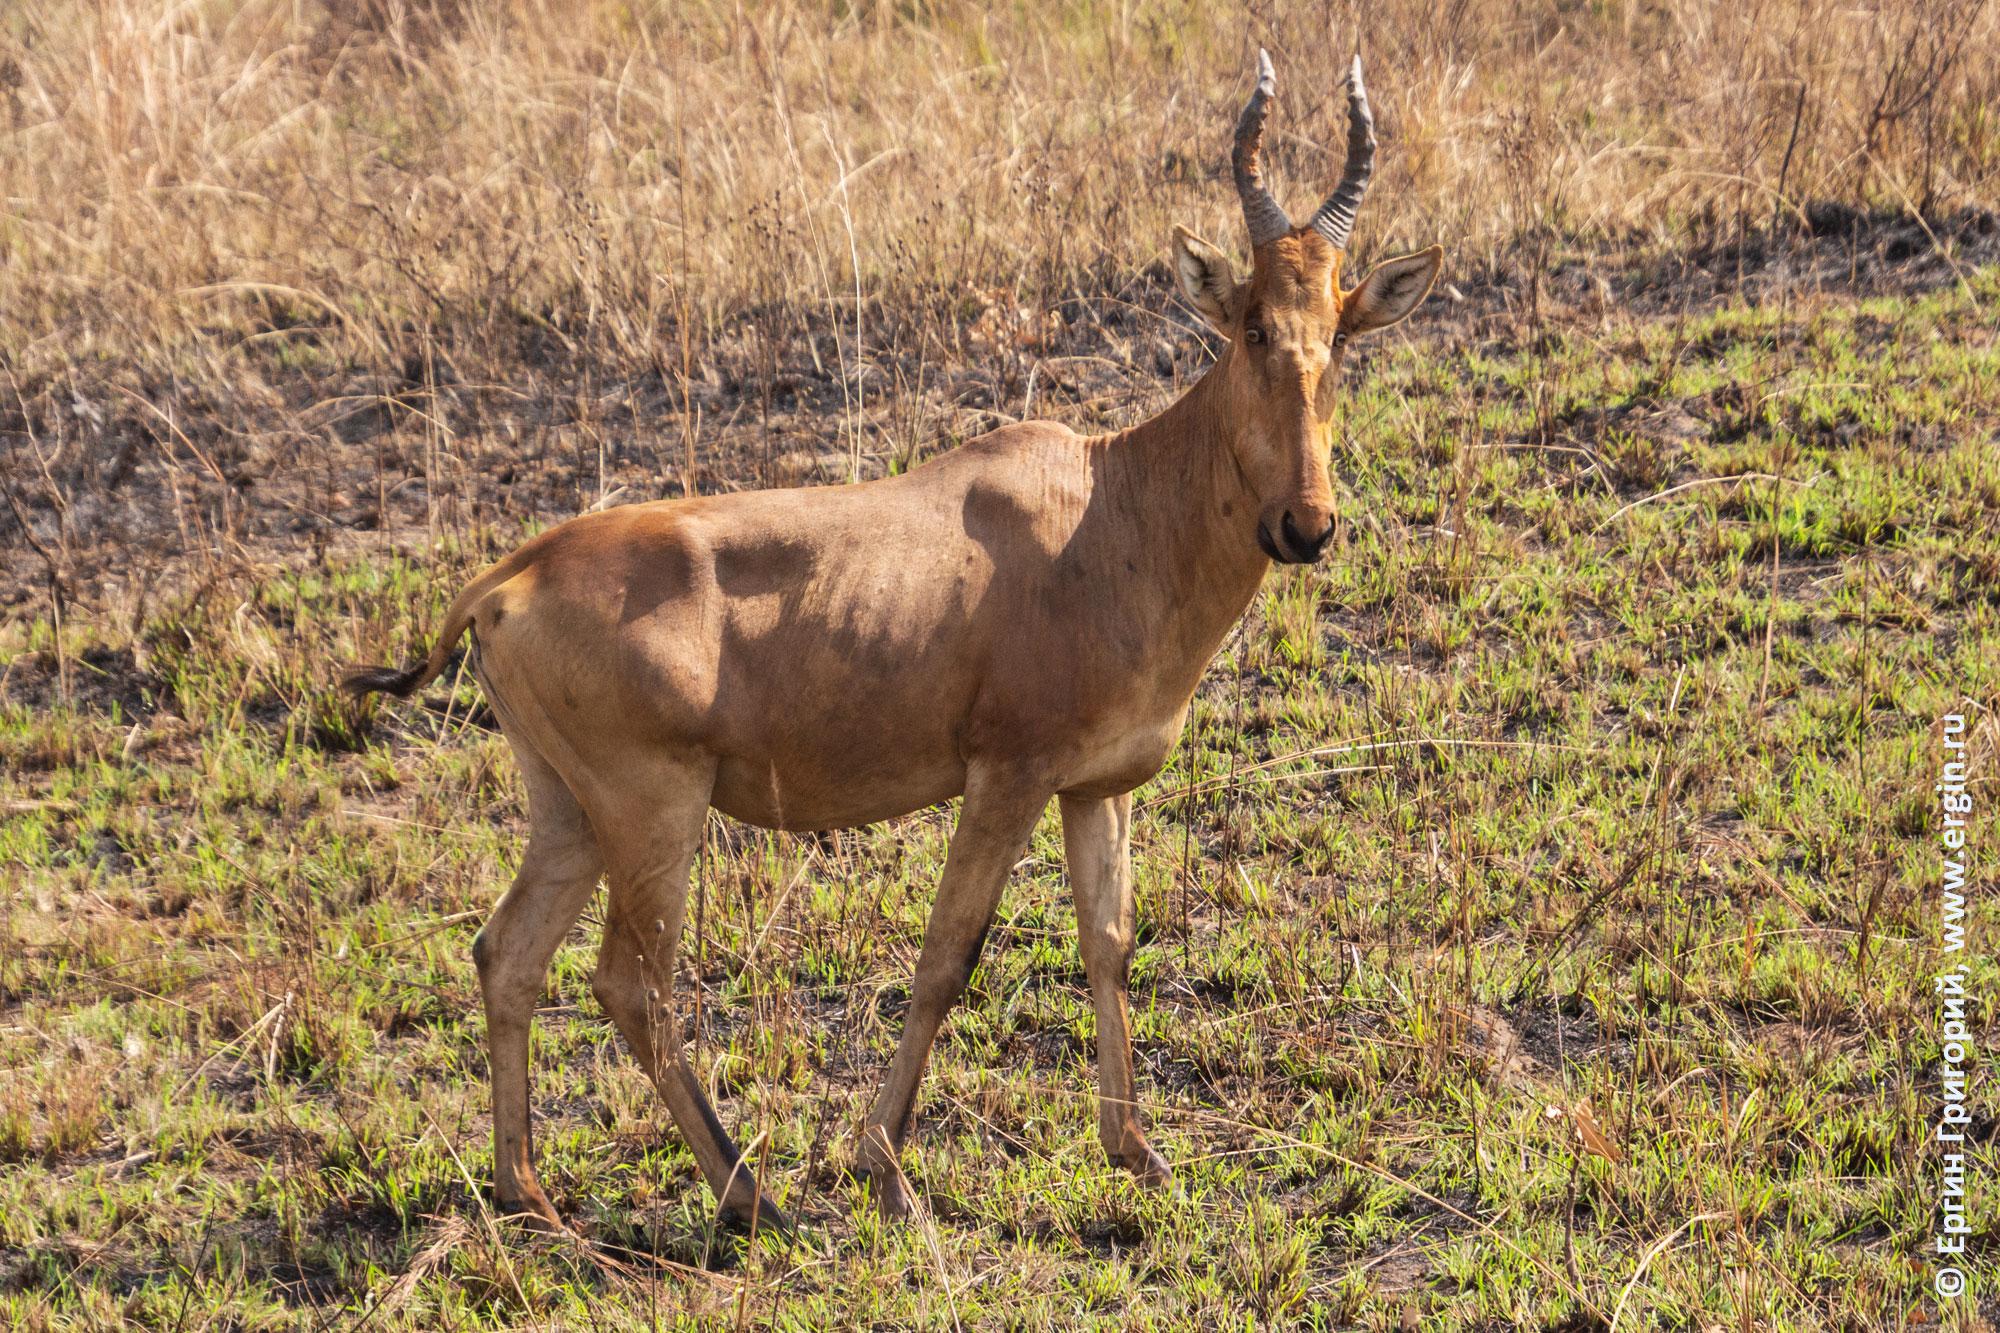 Антилопа Джексона конгони в Африке сафари Уганда